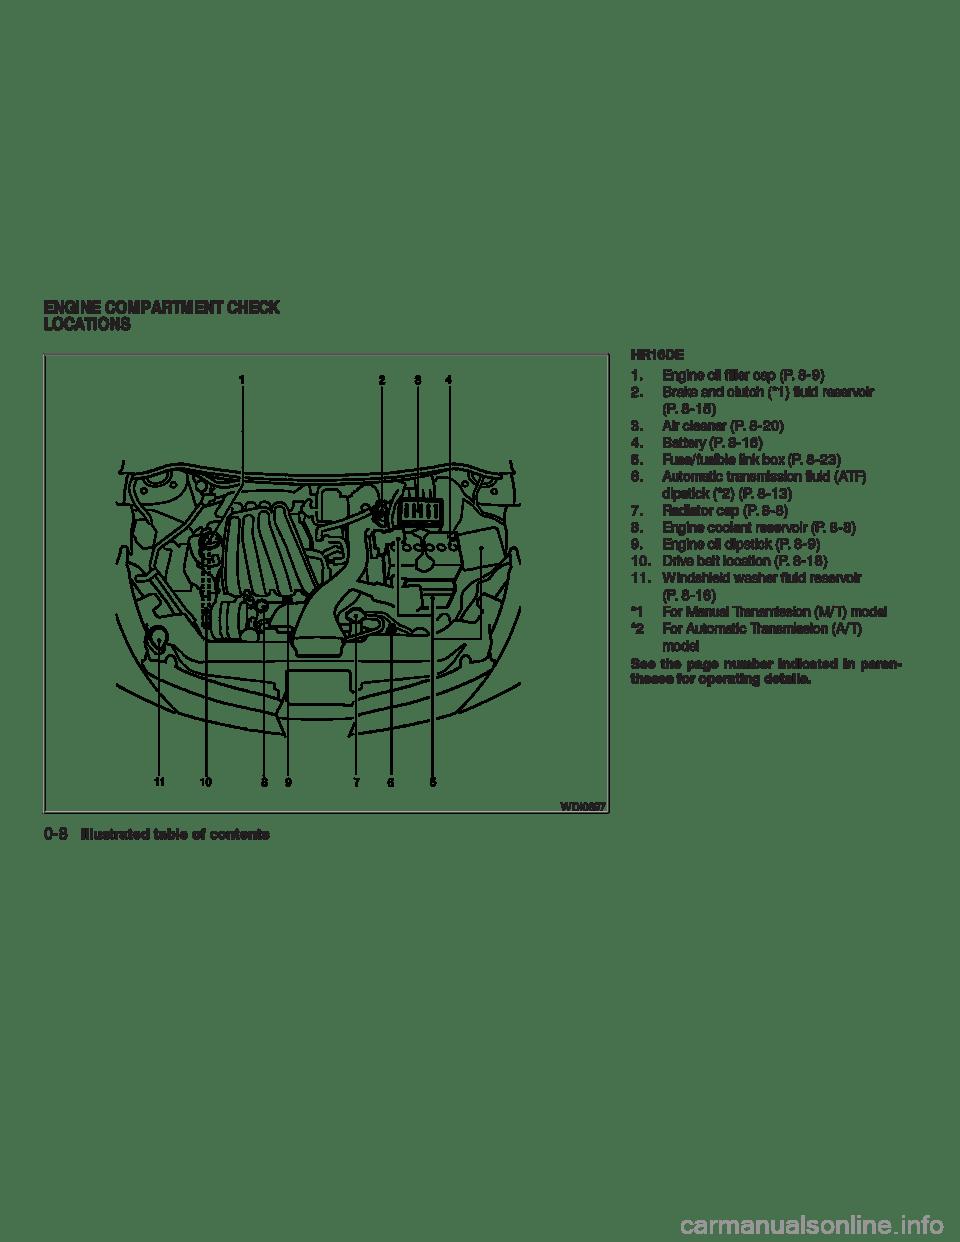 NISSAN VERSA HATCHBACK 2009 1.G Owners Manual